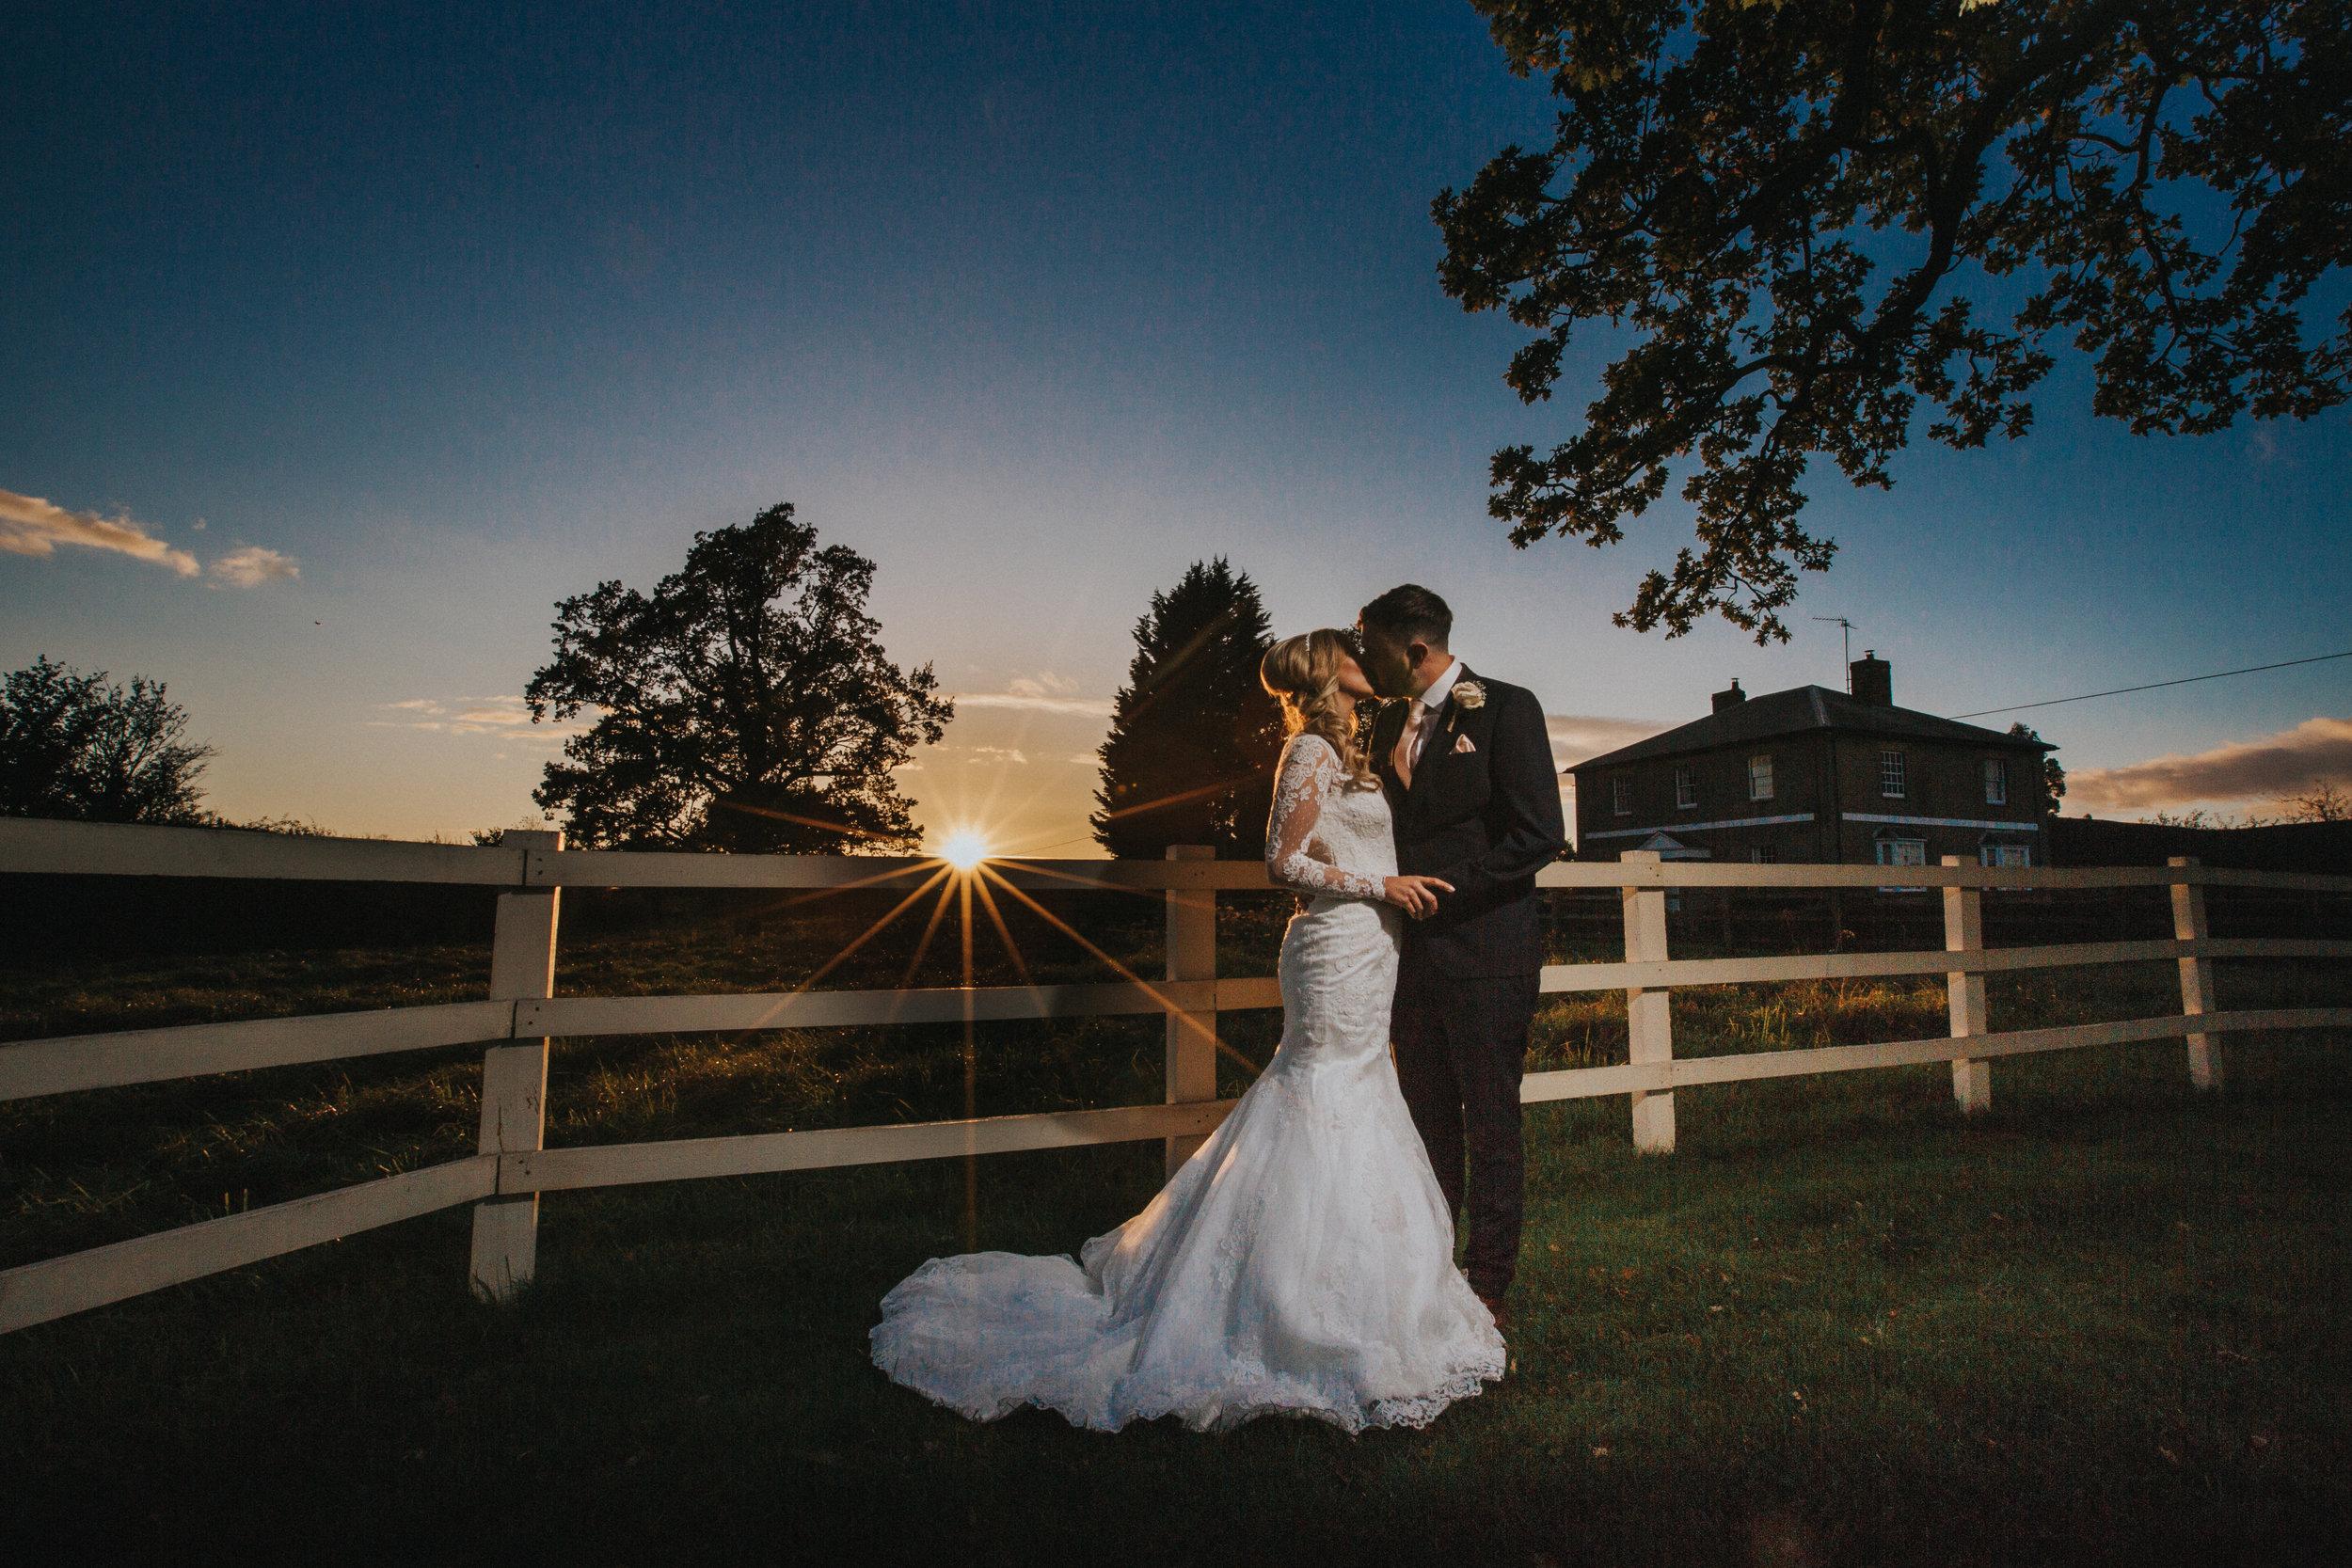 london-hertfordshire-wedding-photography-milling-barn-portrait-60